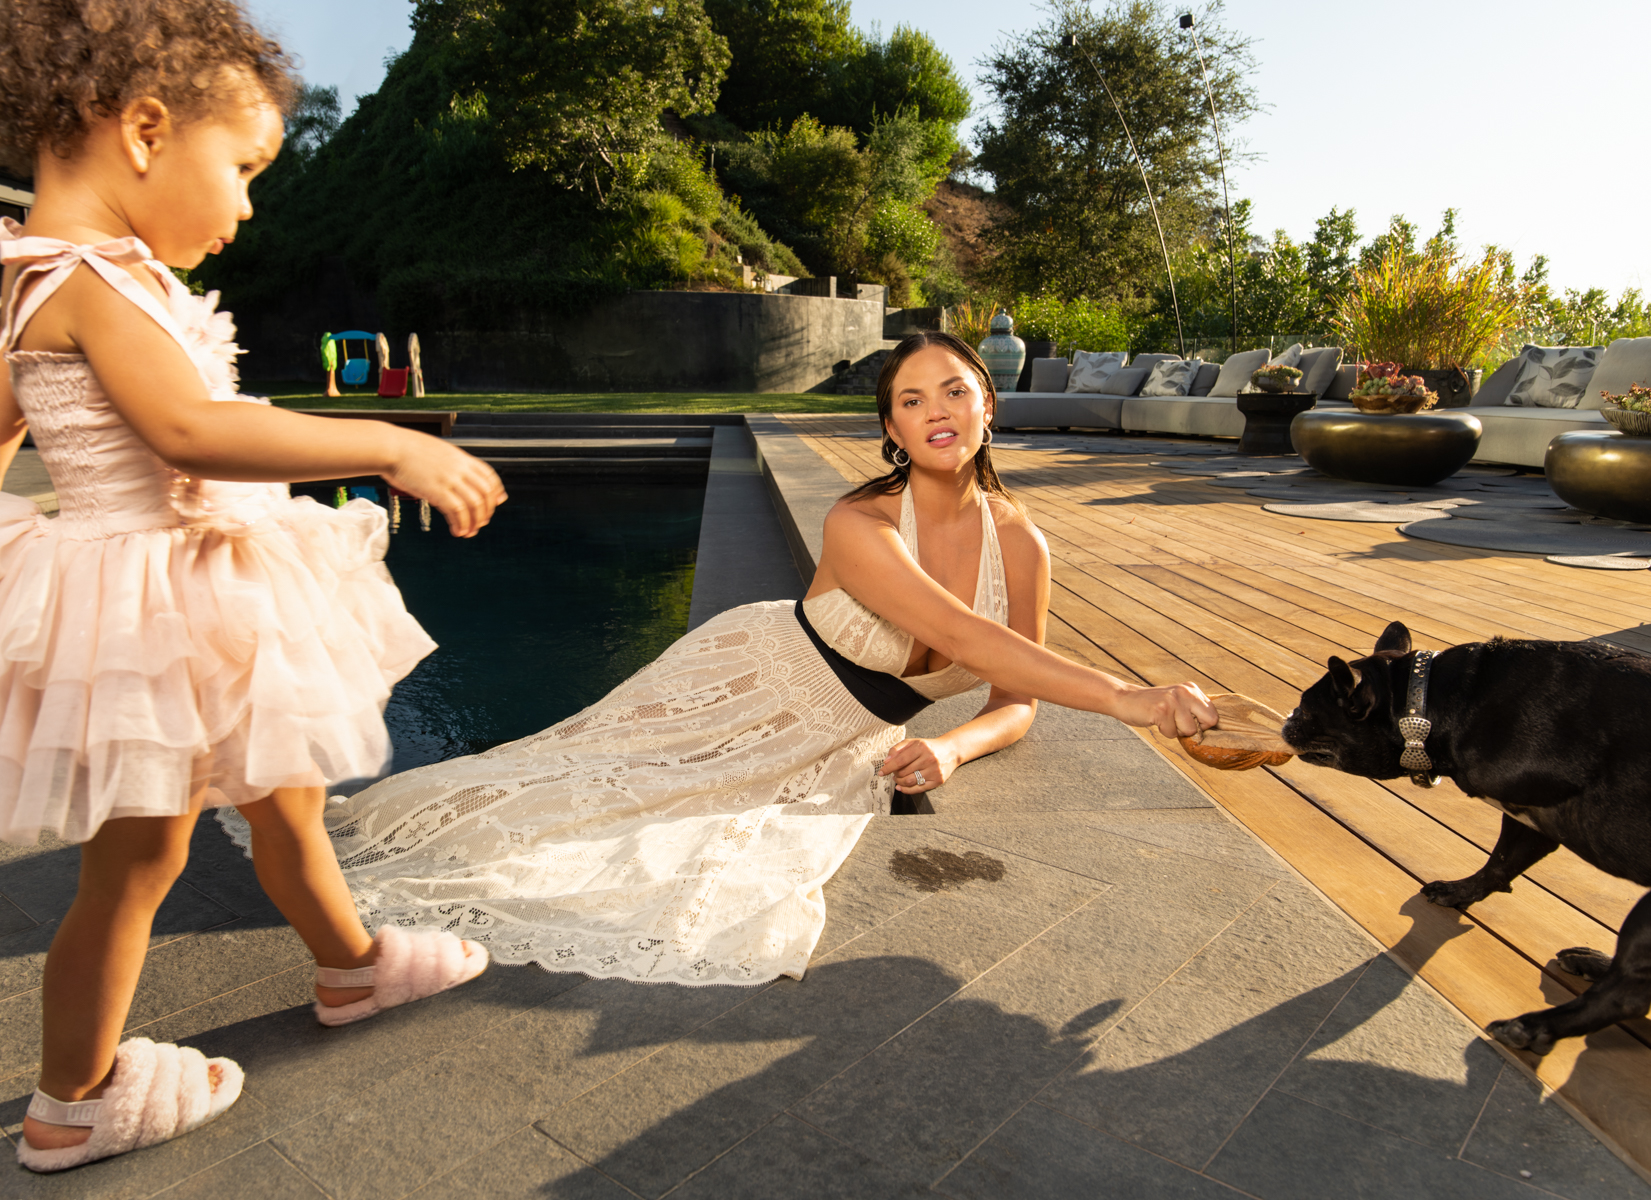 Chrissy Teigen with her daughter Luna, and dog Penny / Vogue Magazine